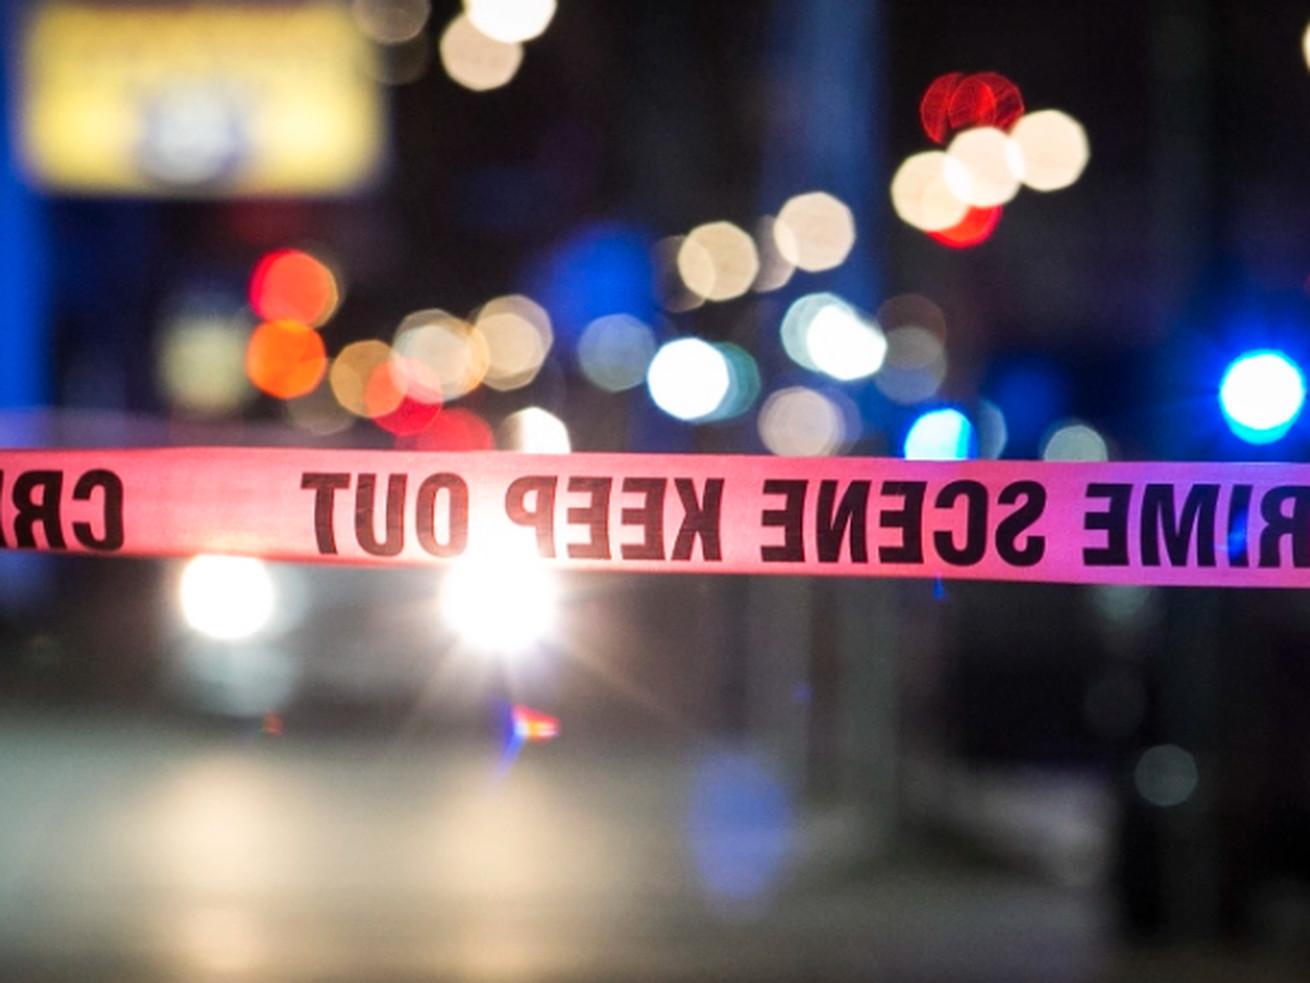 Thirteen  people were shot, 3 fatally, May 19, 2021.